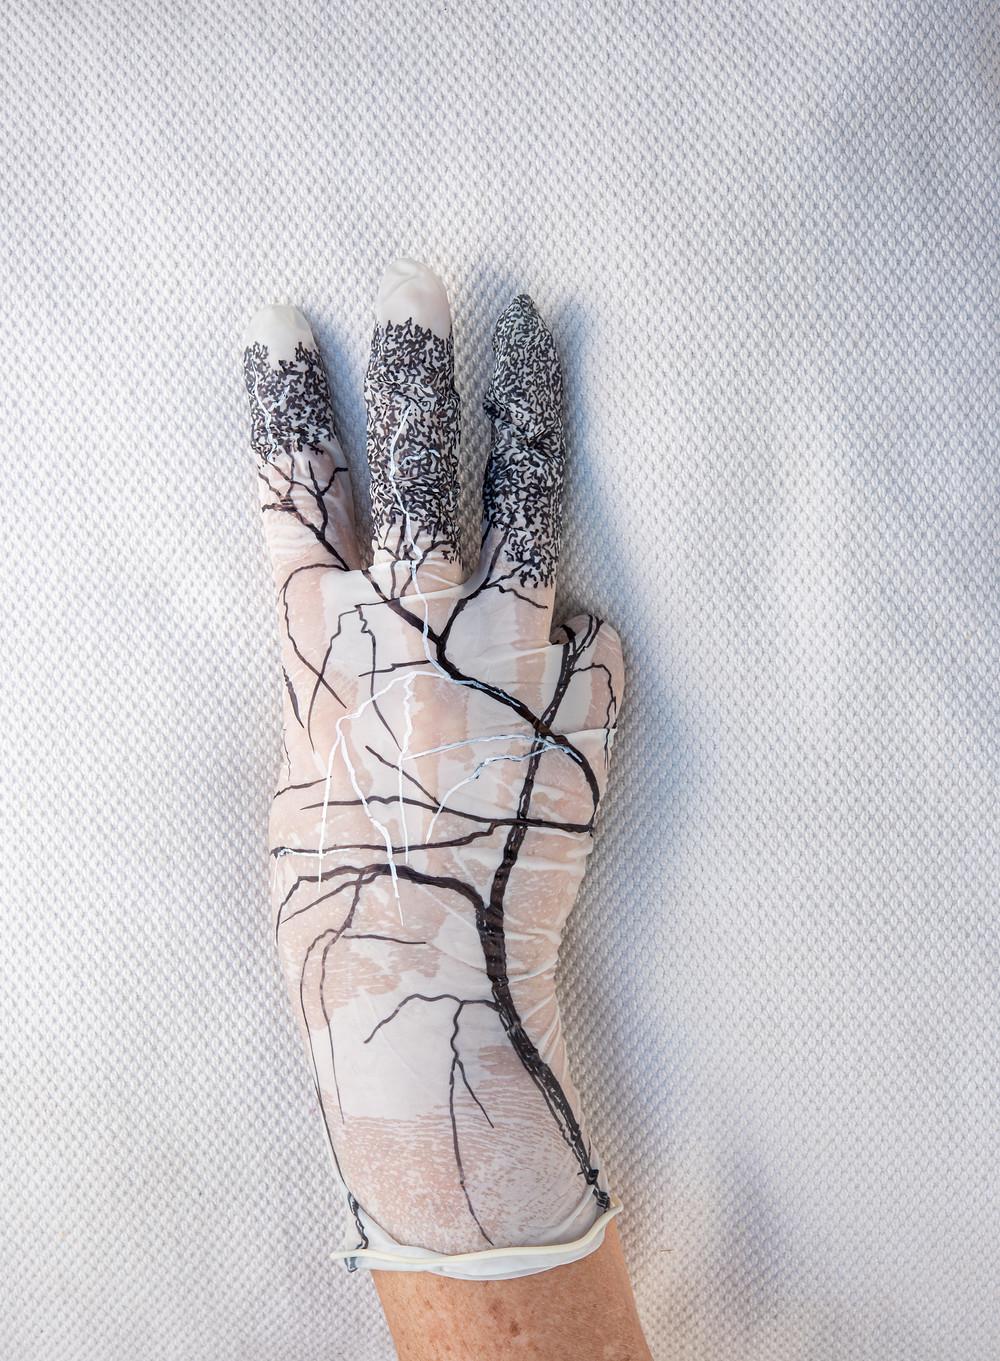 Skin Metamorphosis - Tatiana Blanqué